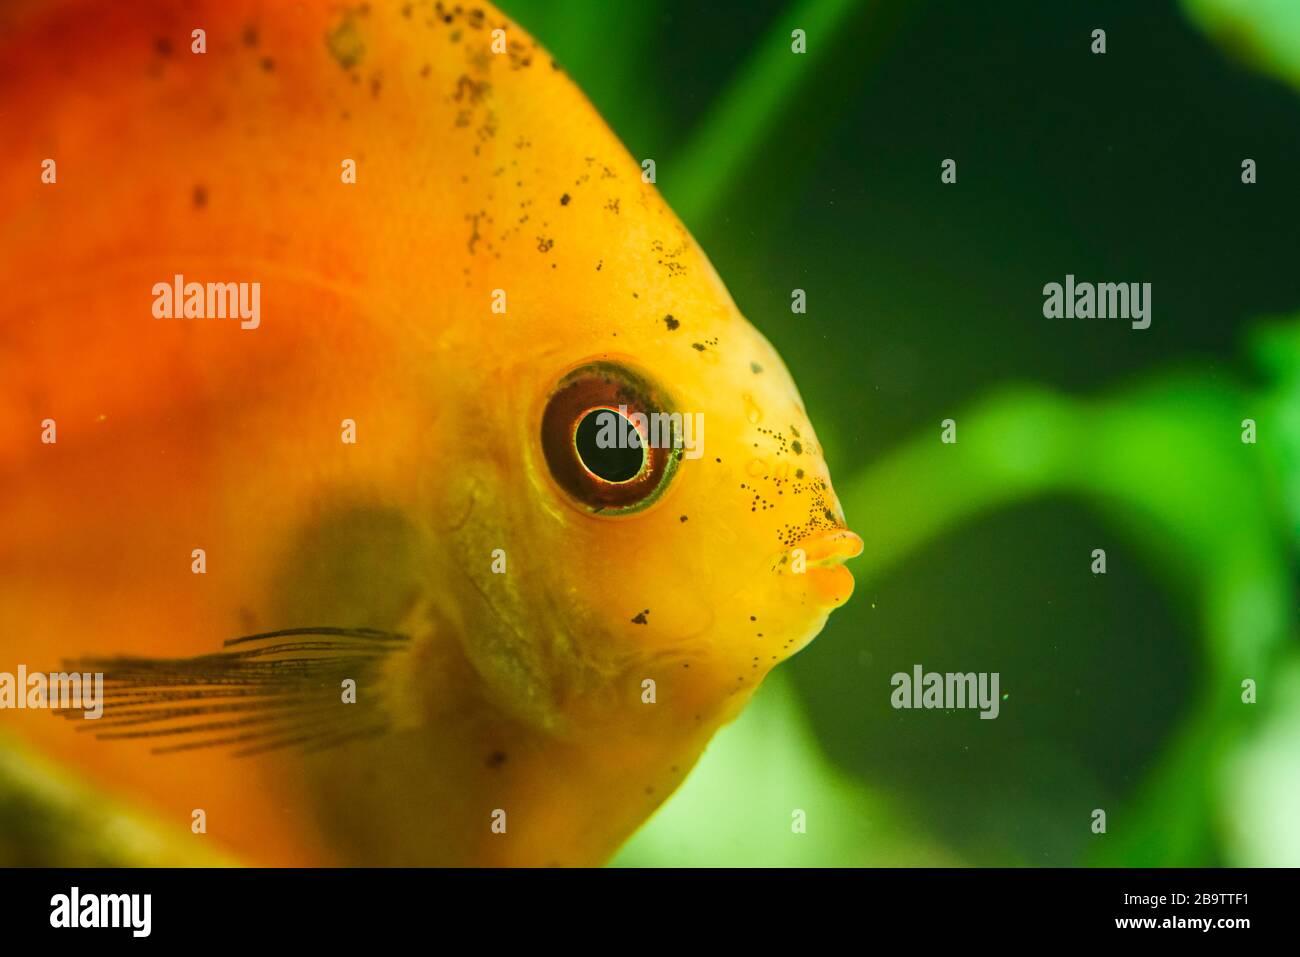 Portrait of a red orange tropical Symphysodon discus fish in a fishtank. Stock Photo